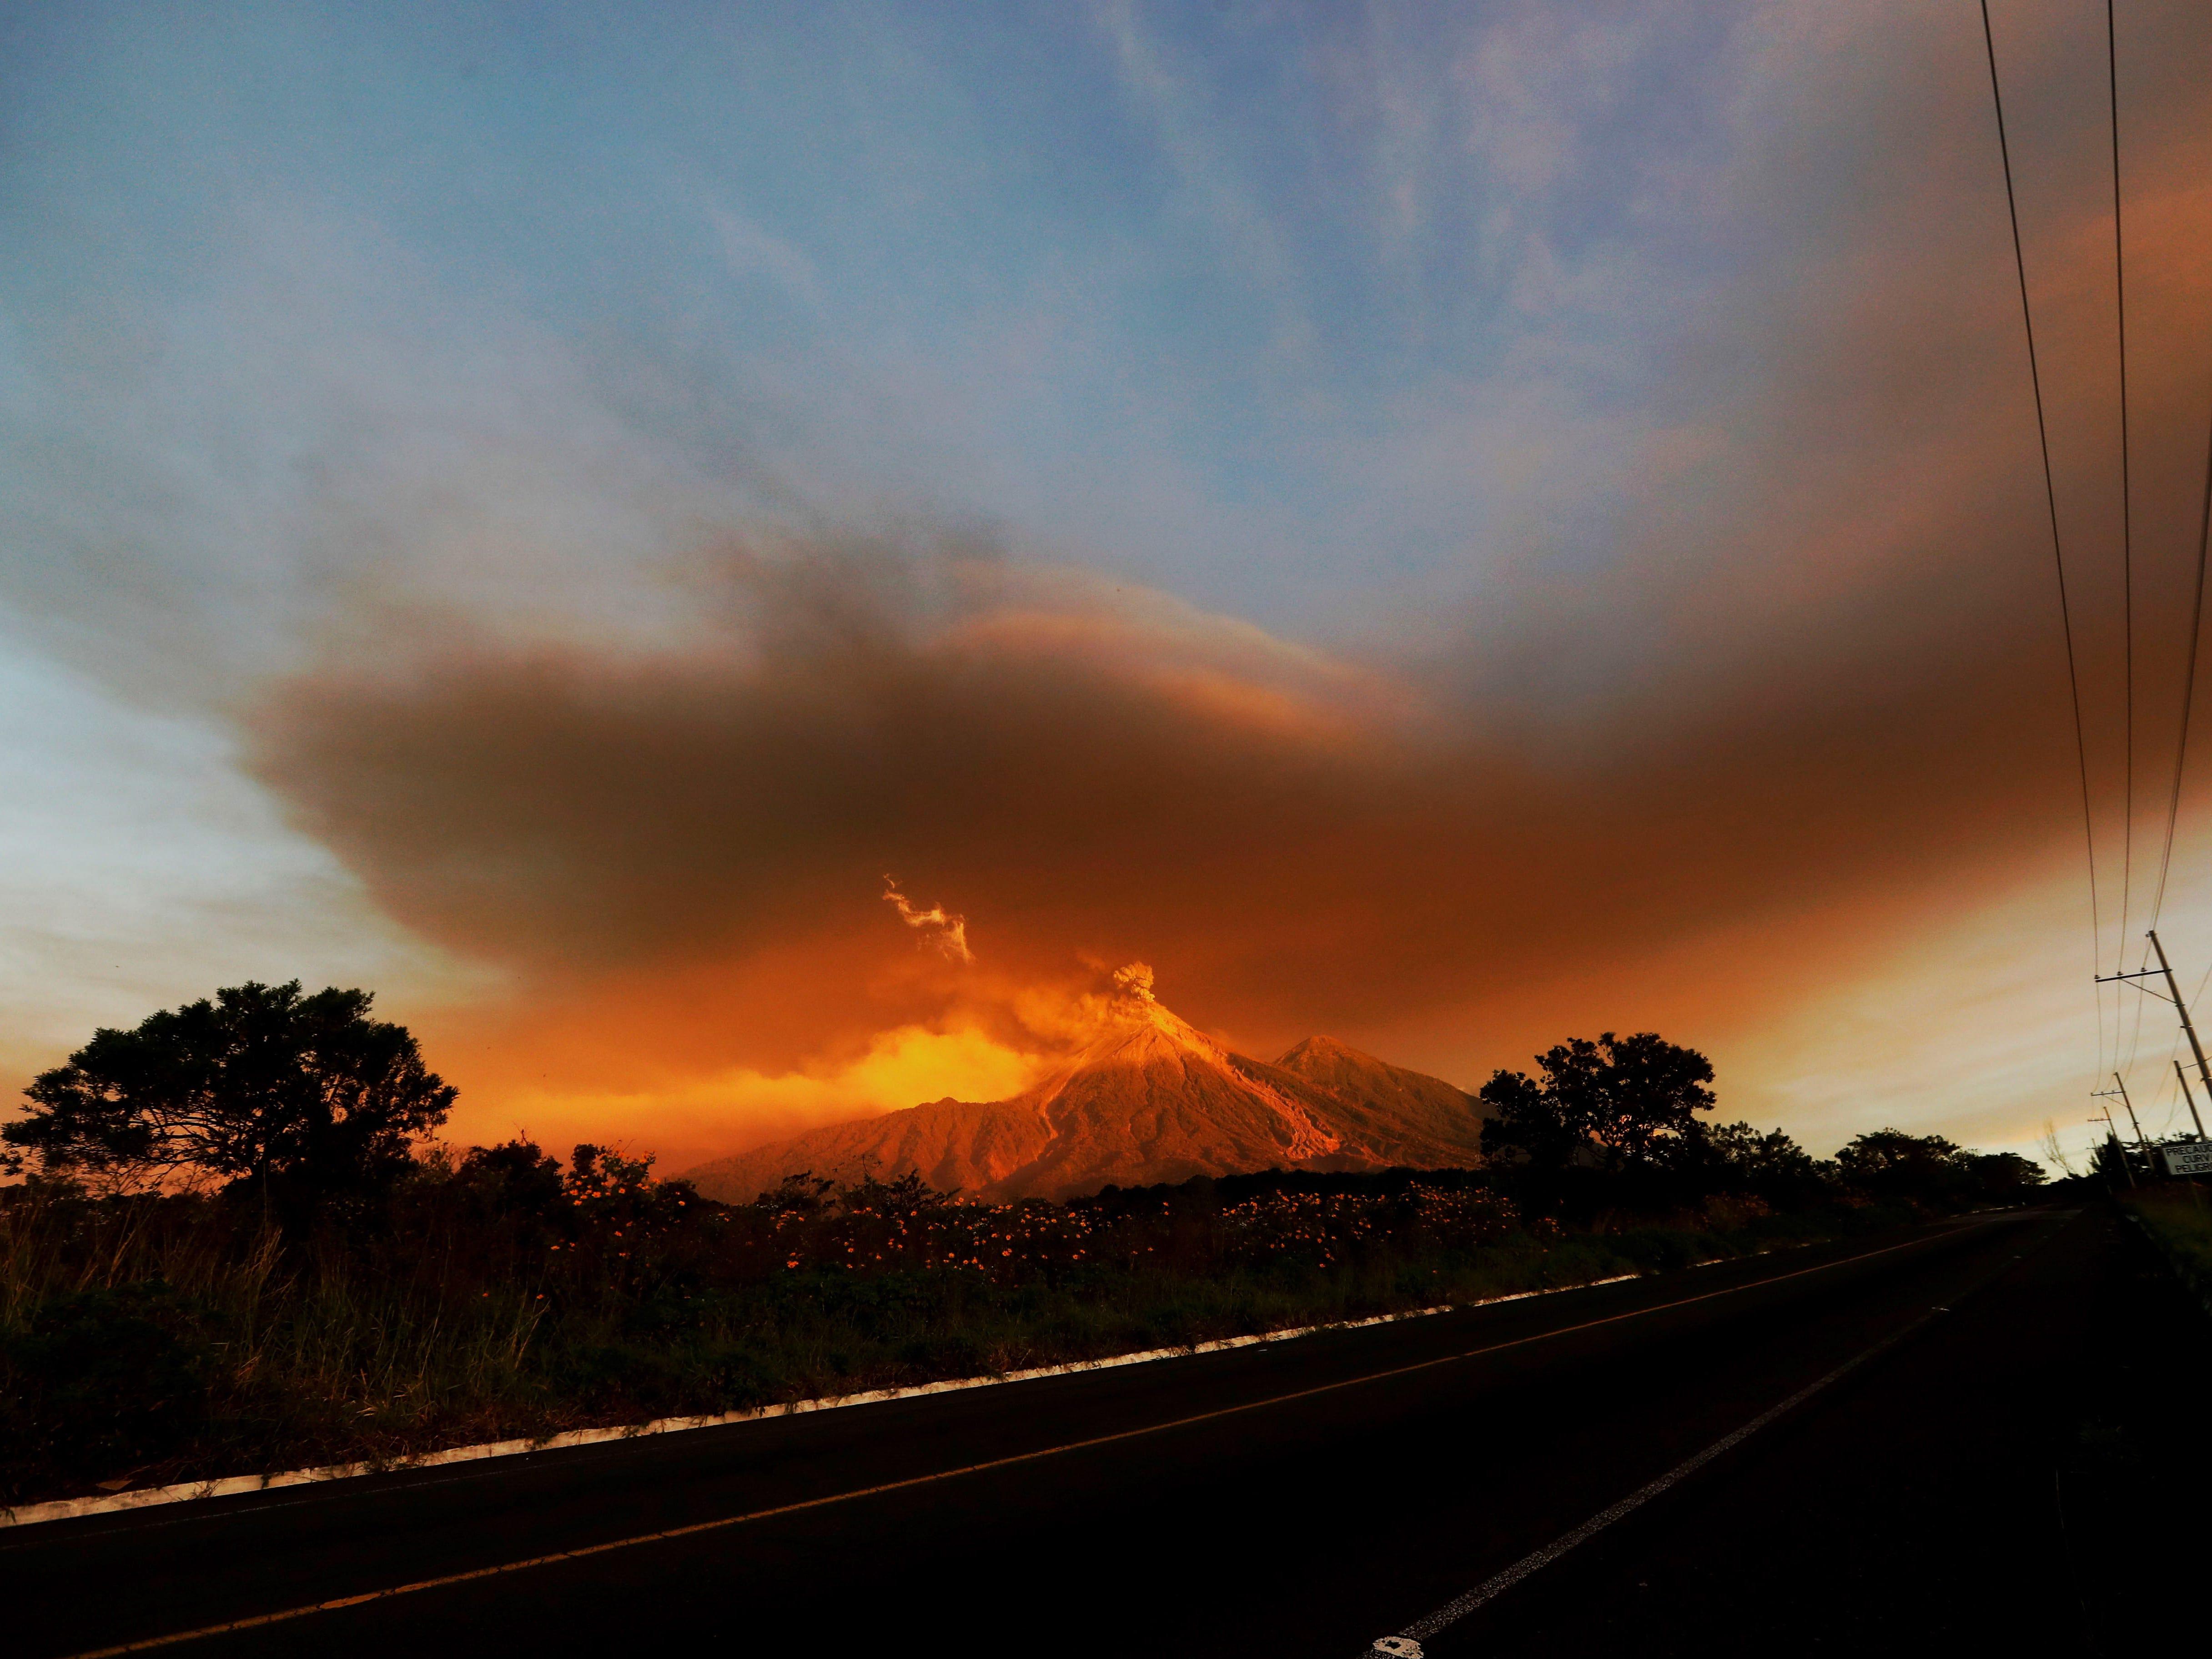 The Fuego volcano erupts at sunrise in Escuintla, Guatemala, Nov. 19, 2018.